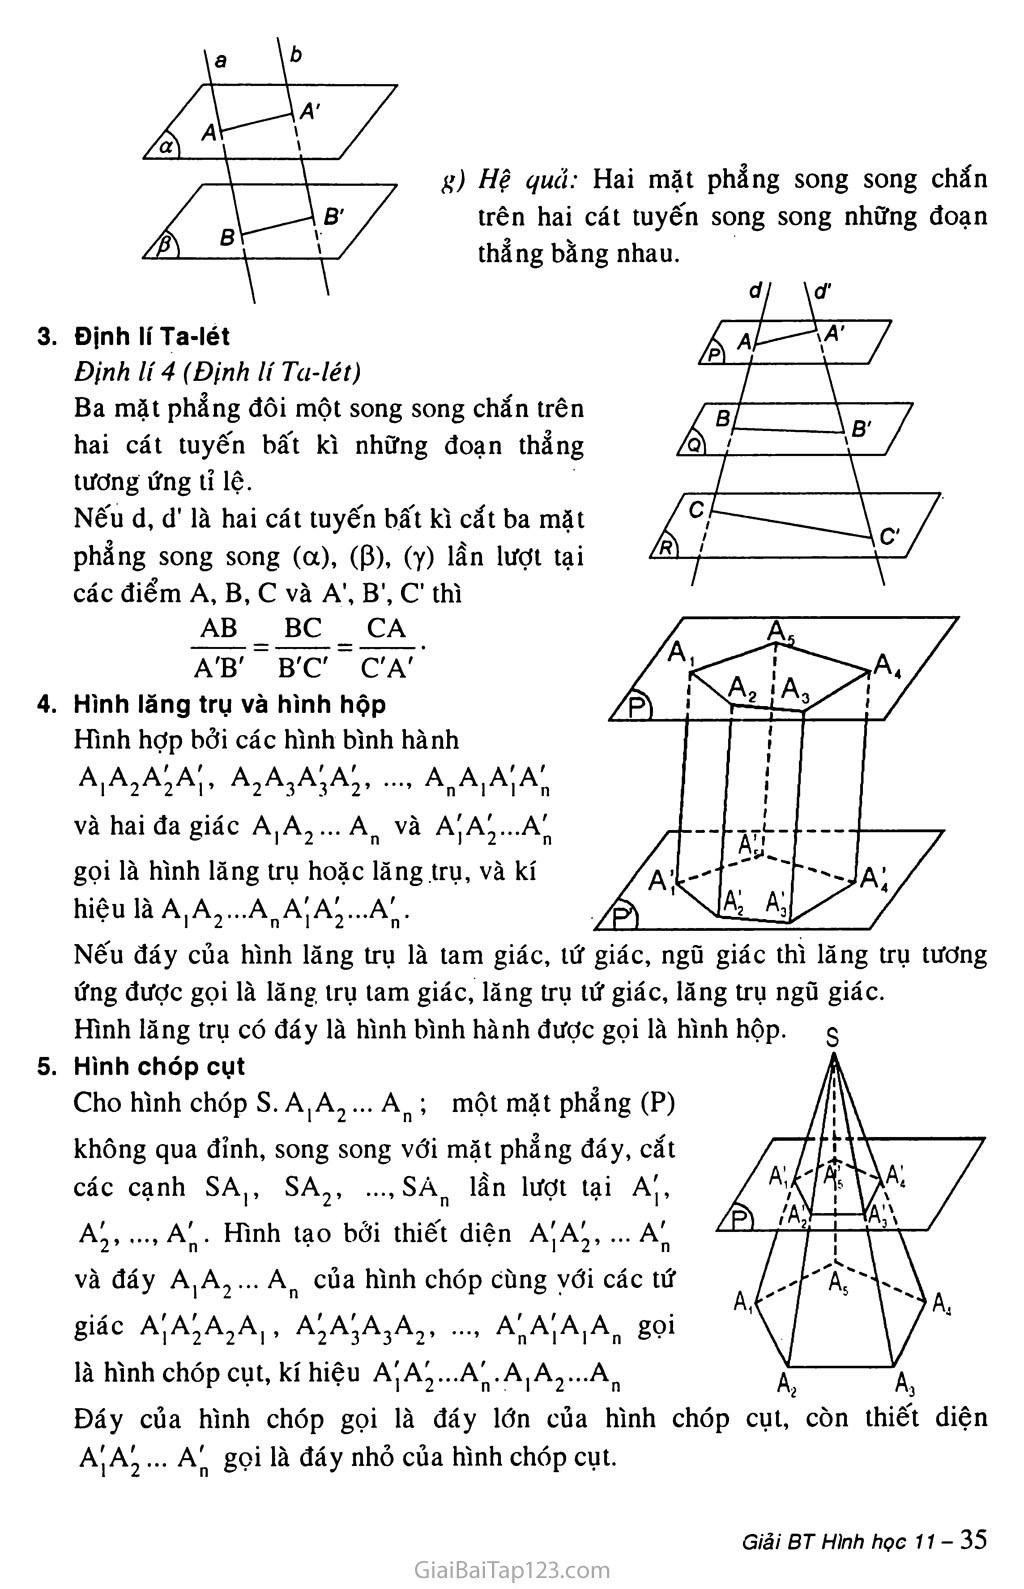 Bài 4. Hai mặt phẳng song song trang 2